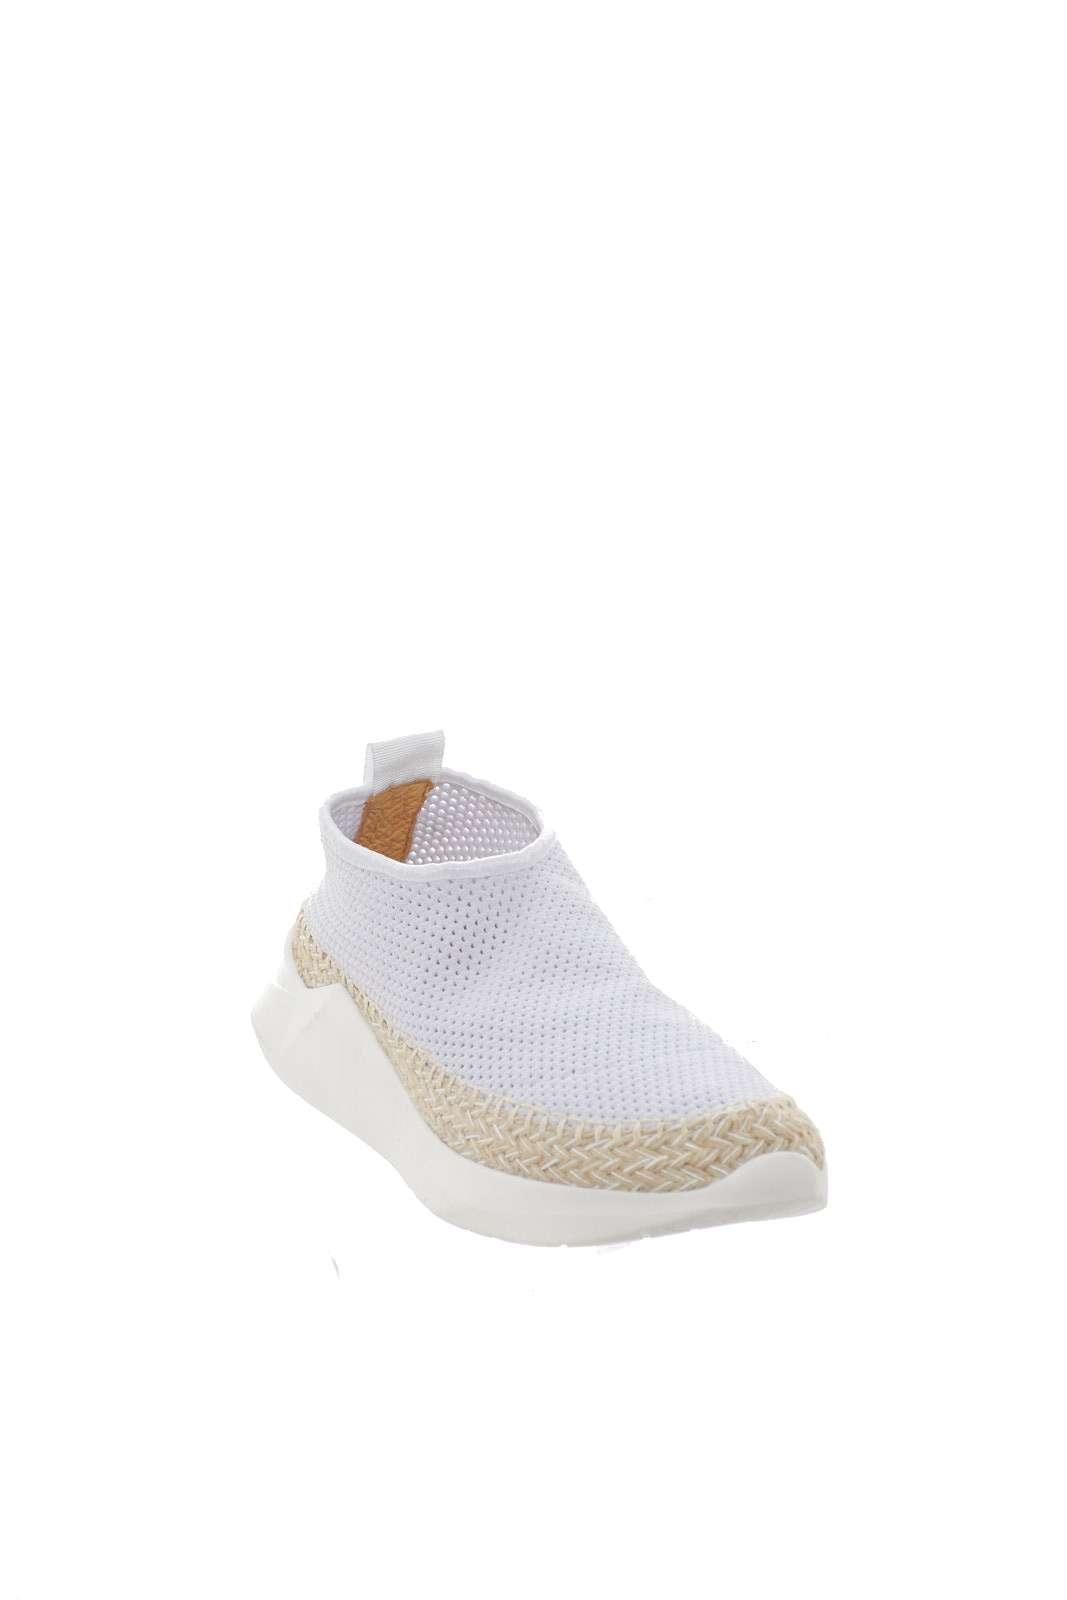 https://www.parmax.com/media/catalog/product/a/i/PE-outlet_parmax-scarpe-donna-PF16-117-B.jpg